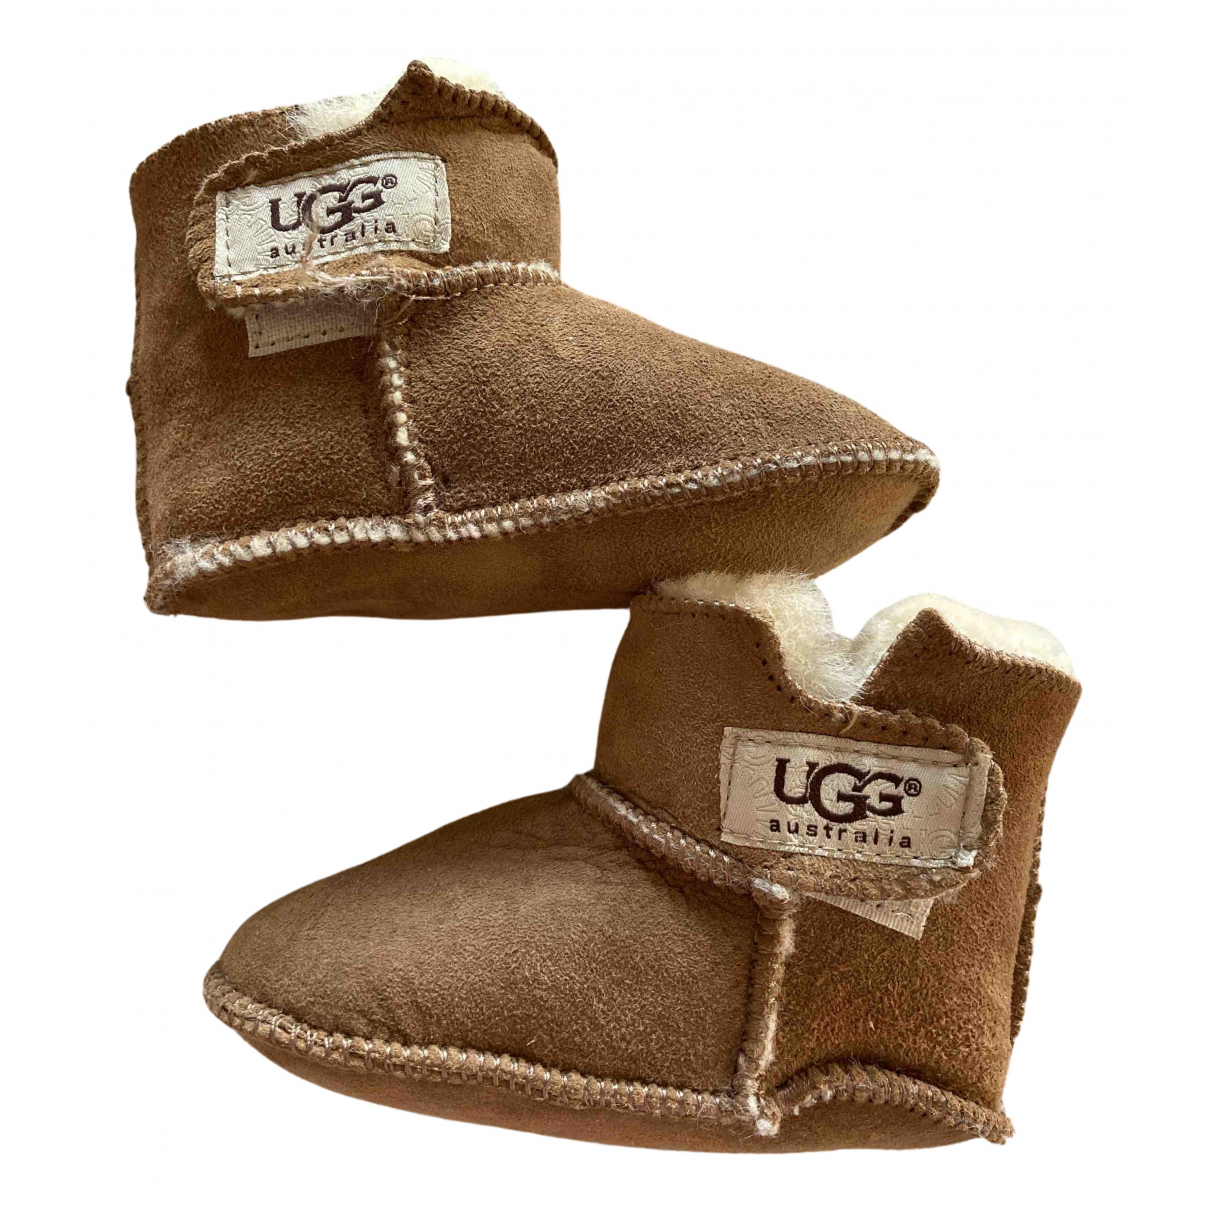 Ugg - Bottes.Bottines   pour enfant en suede - marron